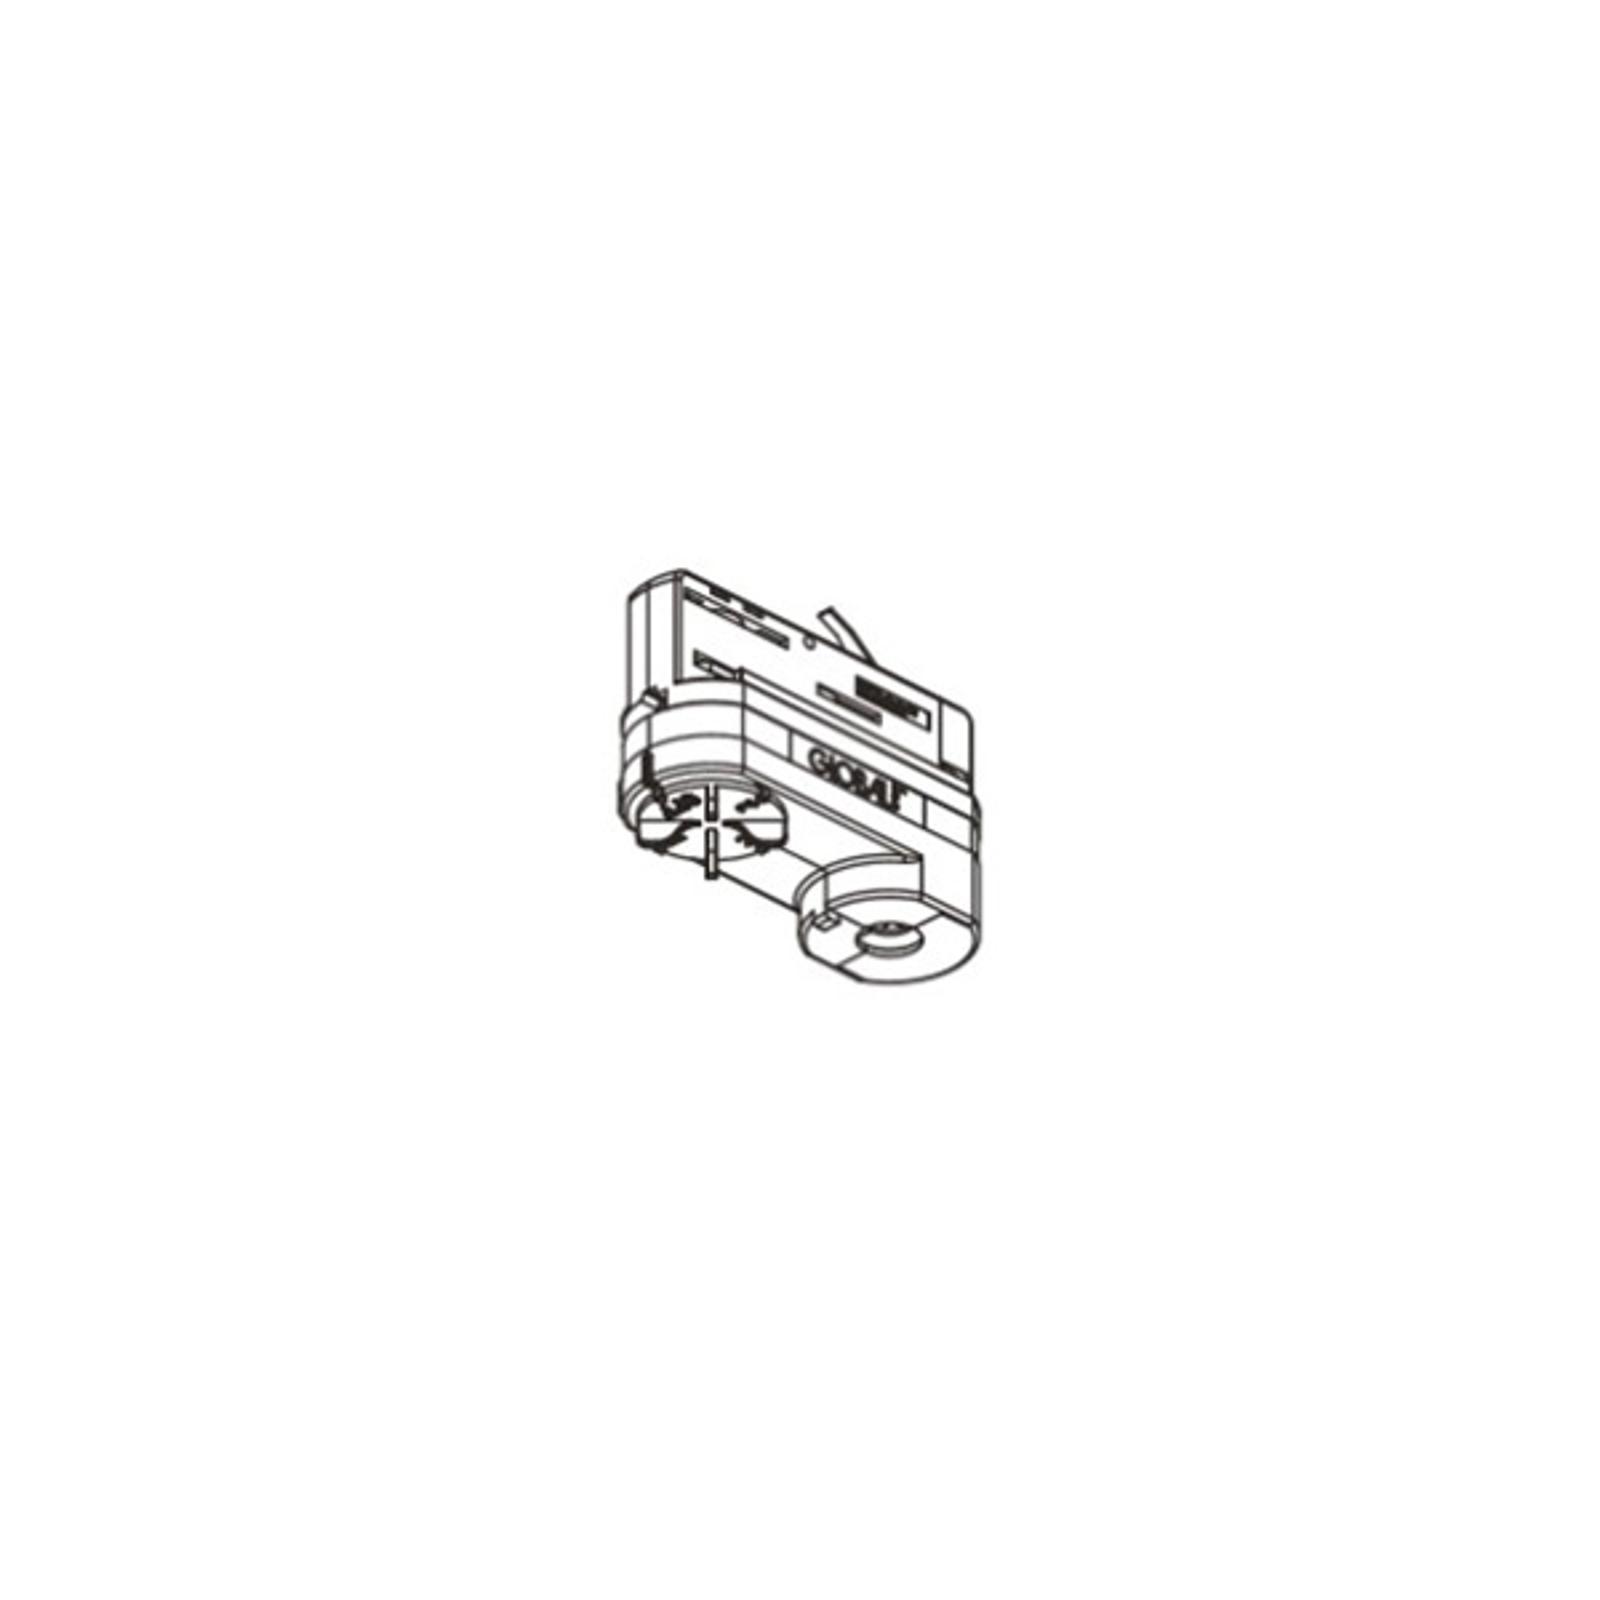 Acquista Multiadapter trifase Noa, carico 10kg